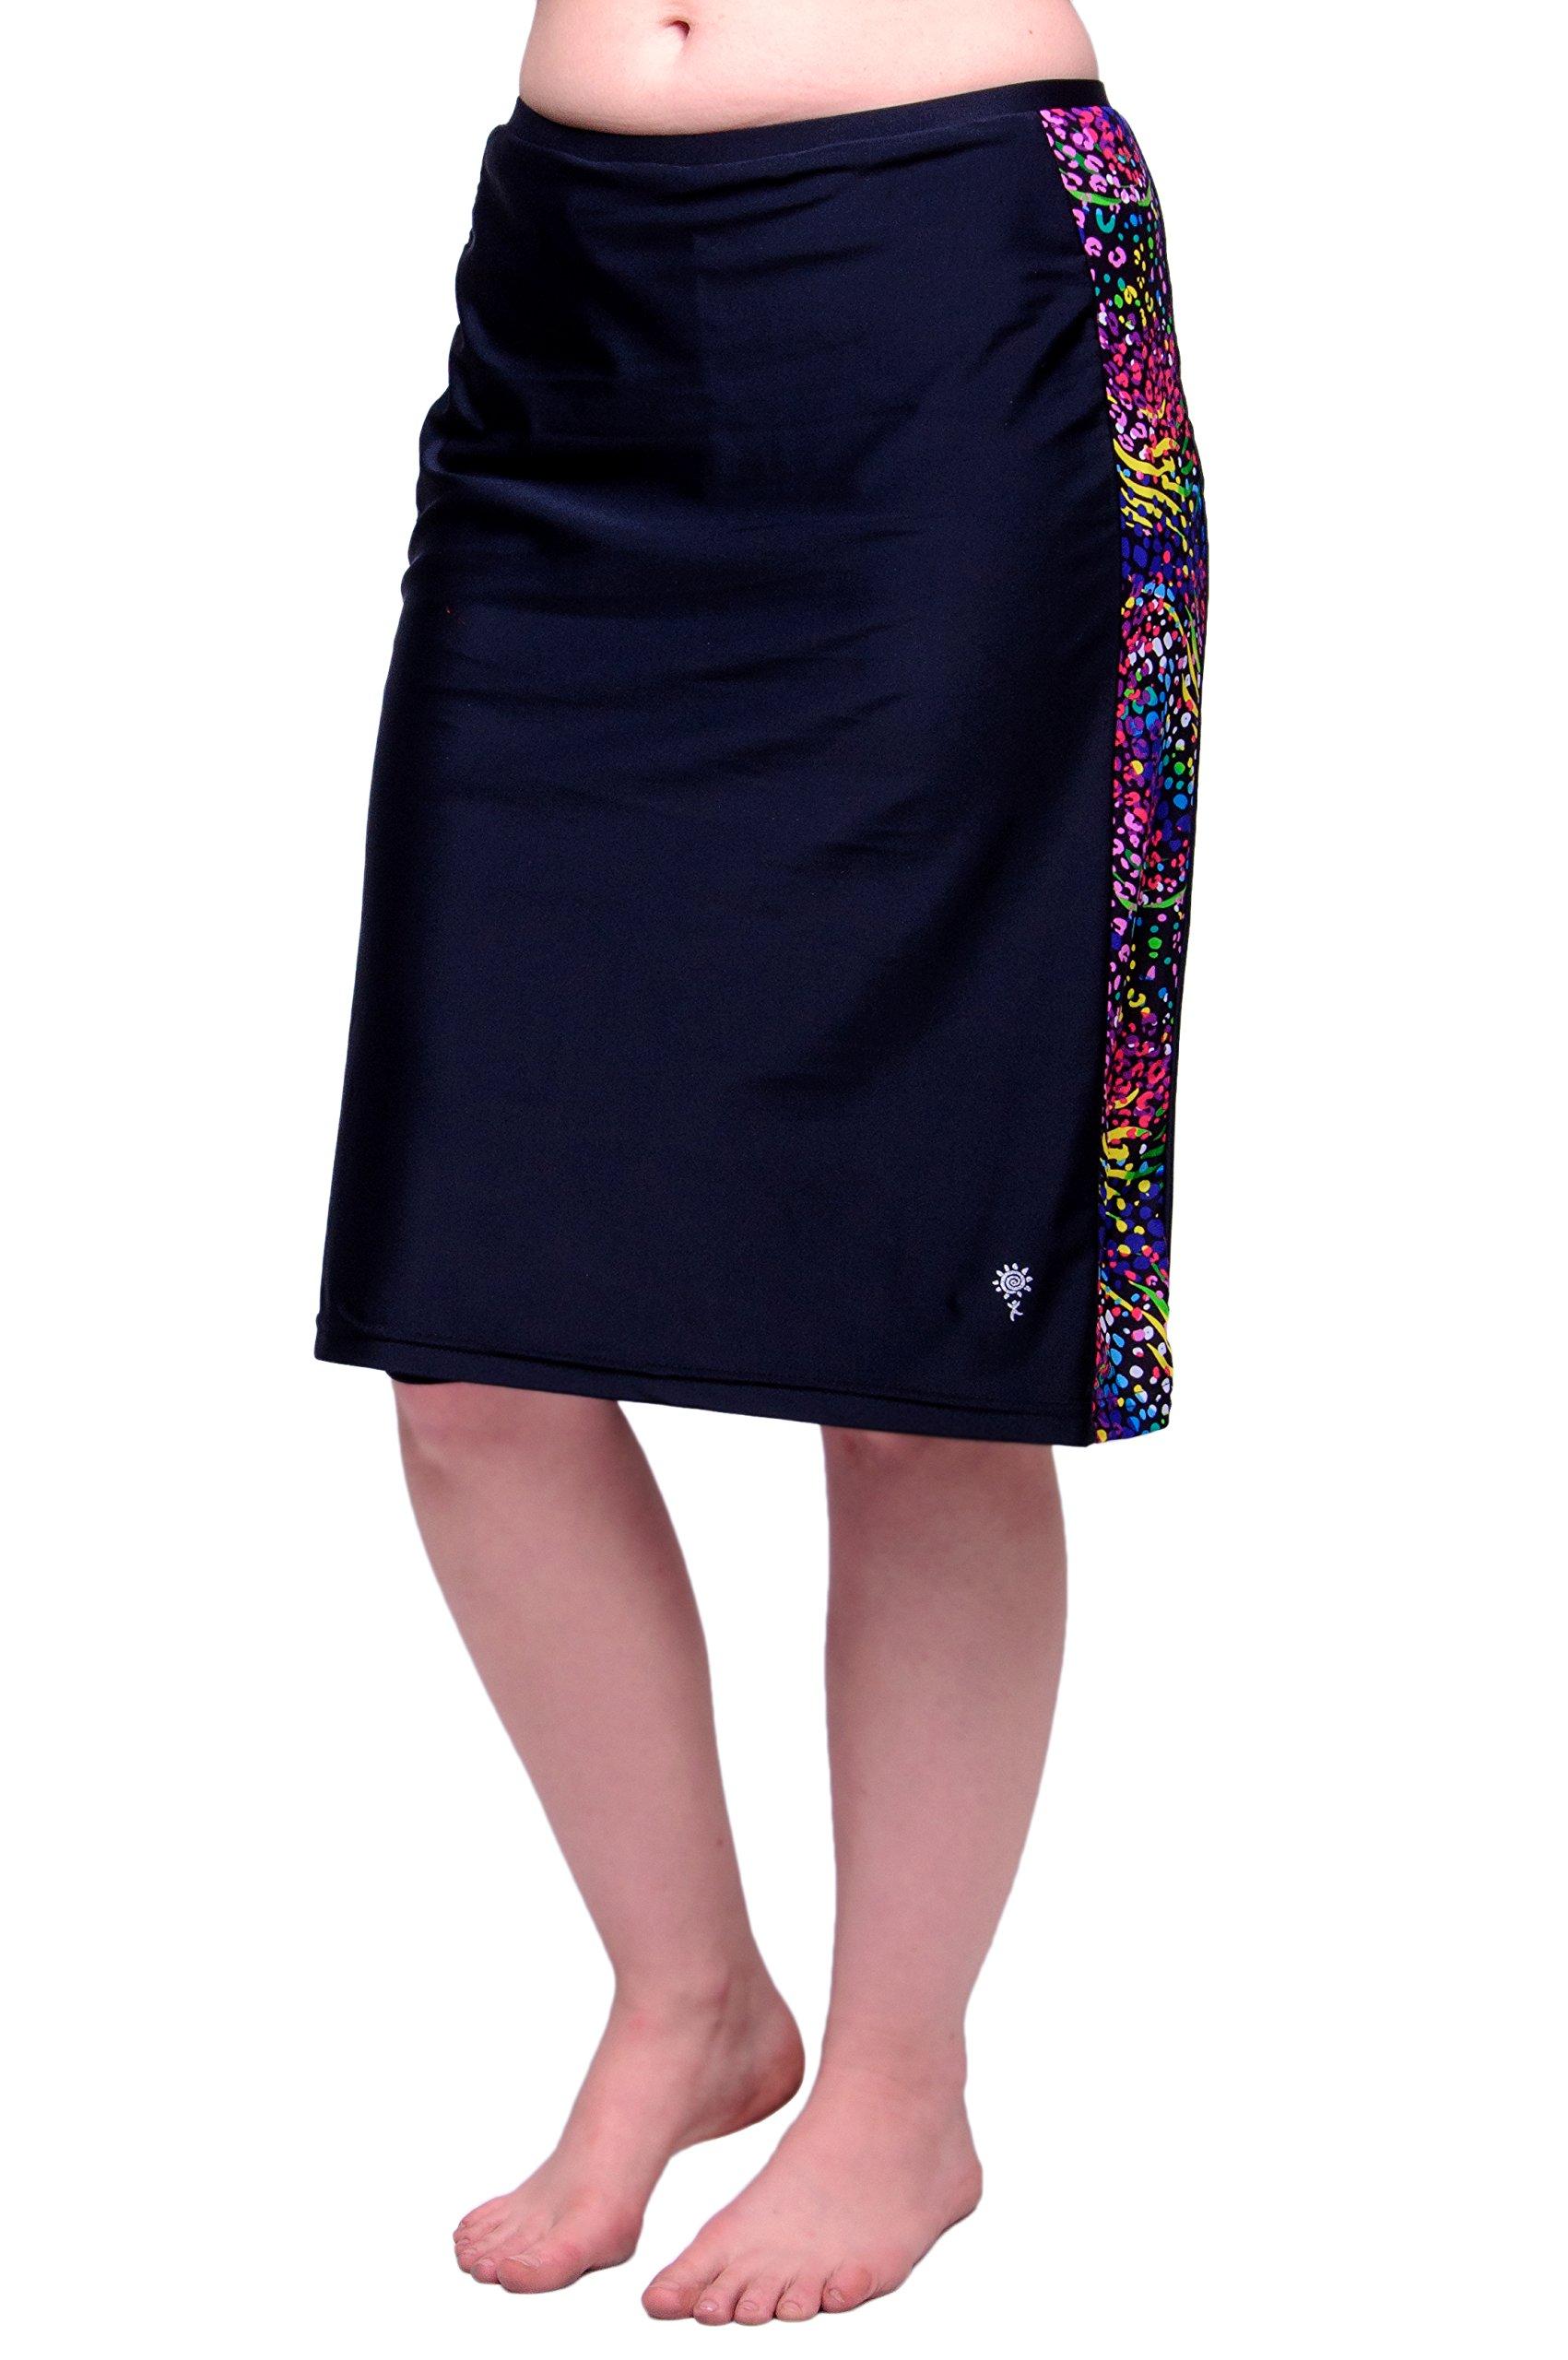 HydroChic Women's Swim Skirt With Attached Leggings – Modest Swim N' Sport Activewear Black/Tiger, Large